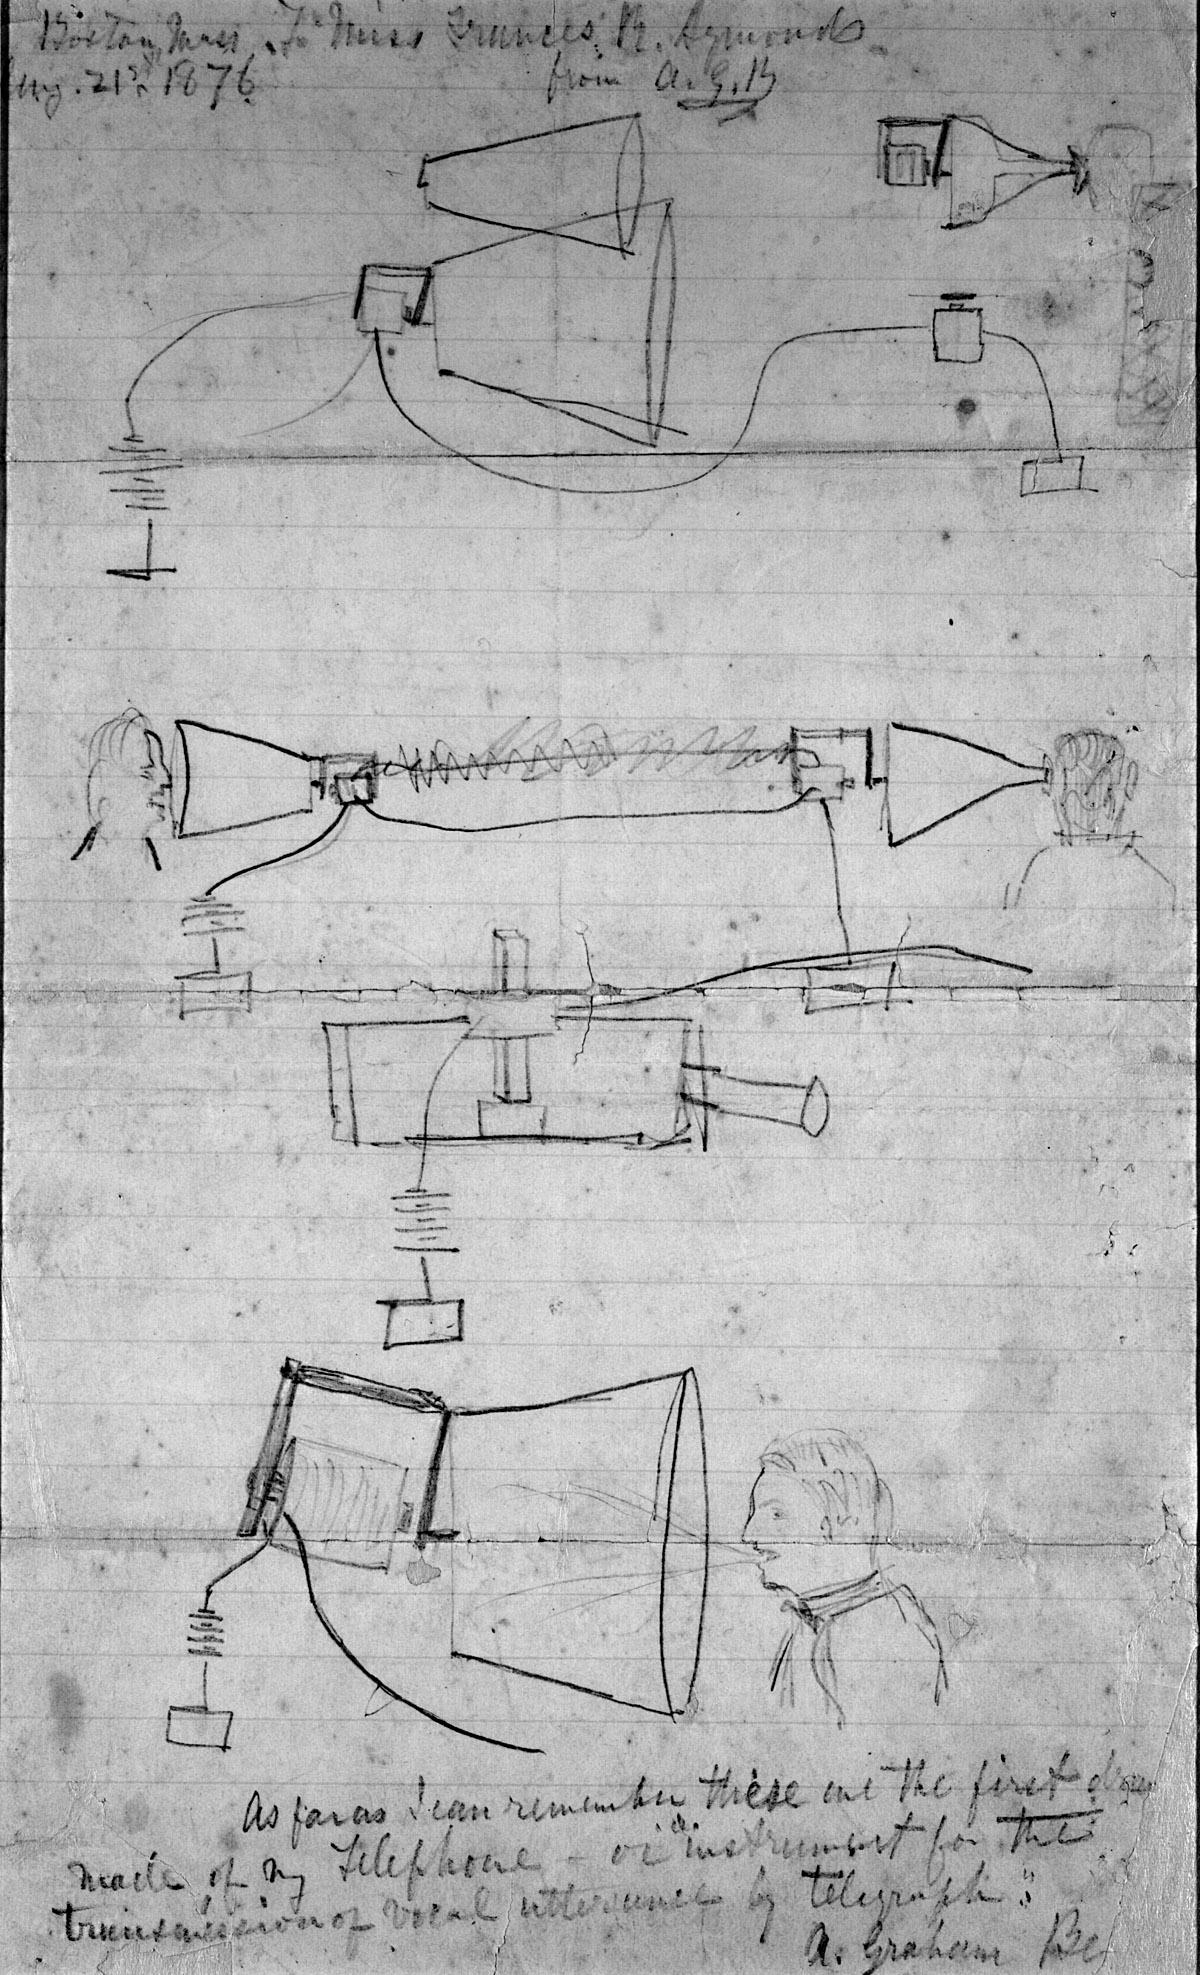 Drawn telephone alexander graham bell telephone #13